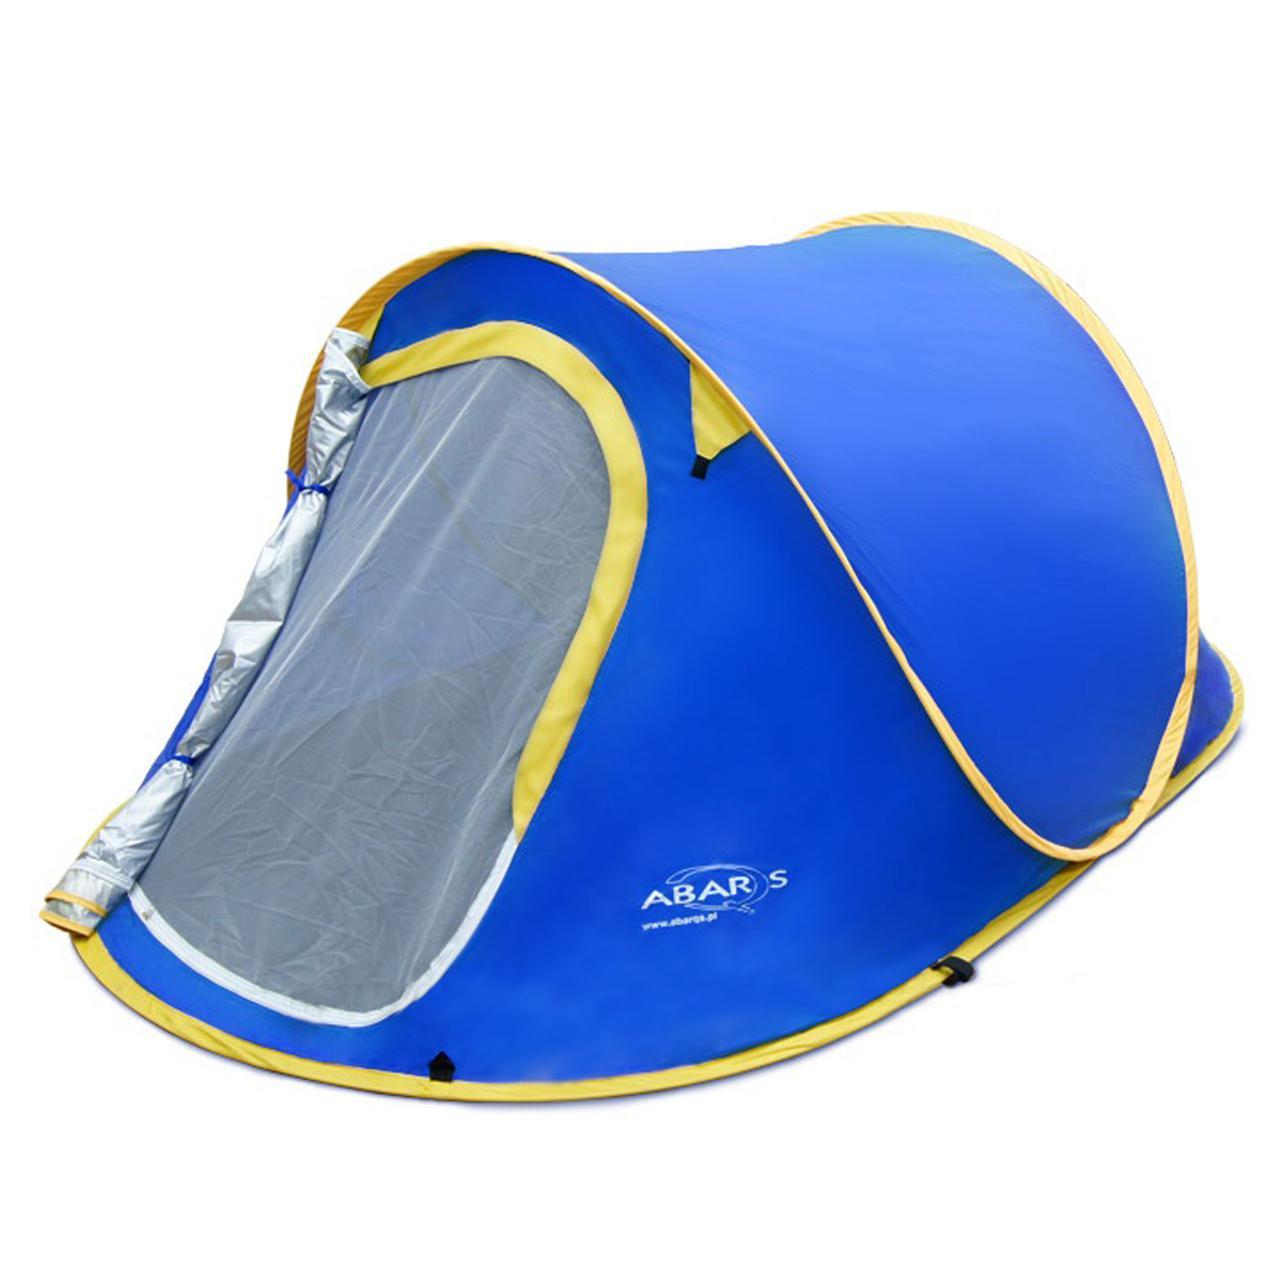 Палатка самораскладная Abarqs Quick 2, 3000 мм